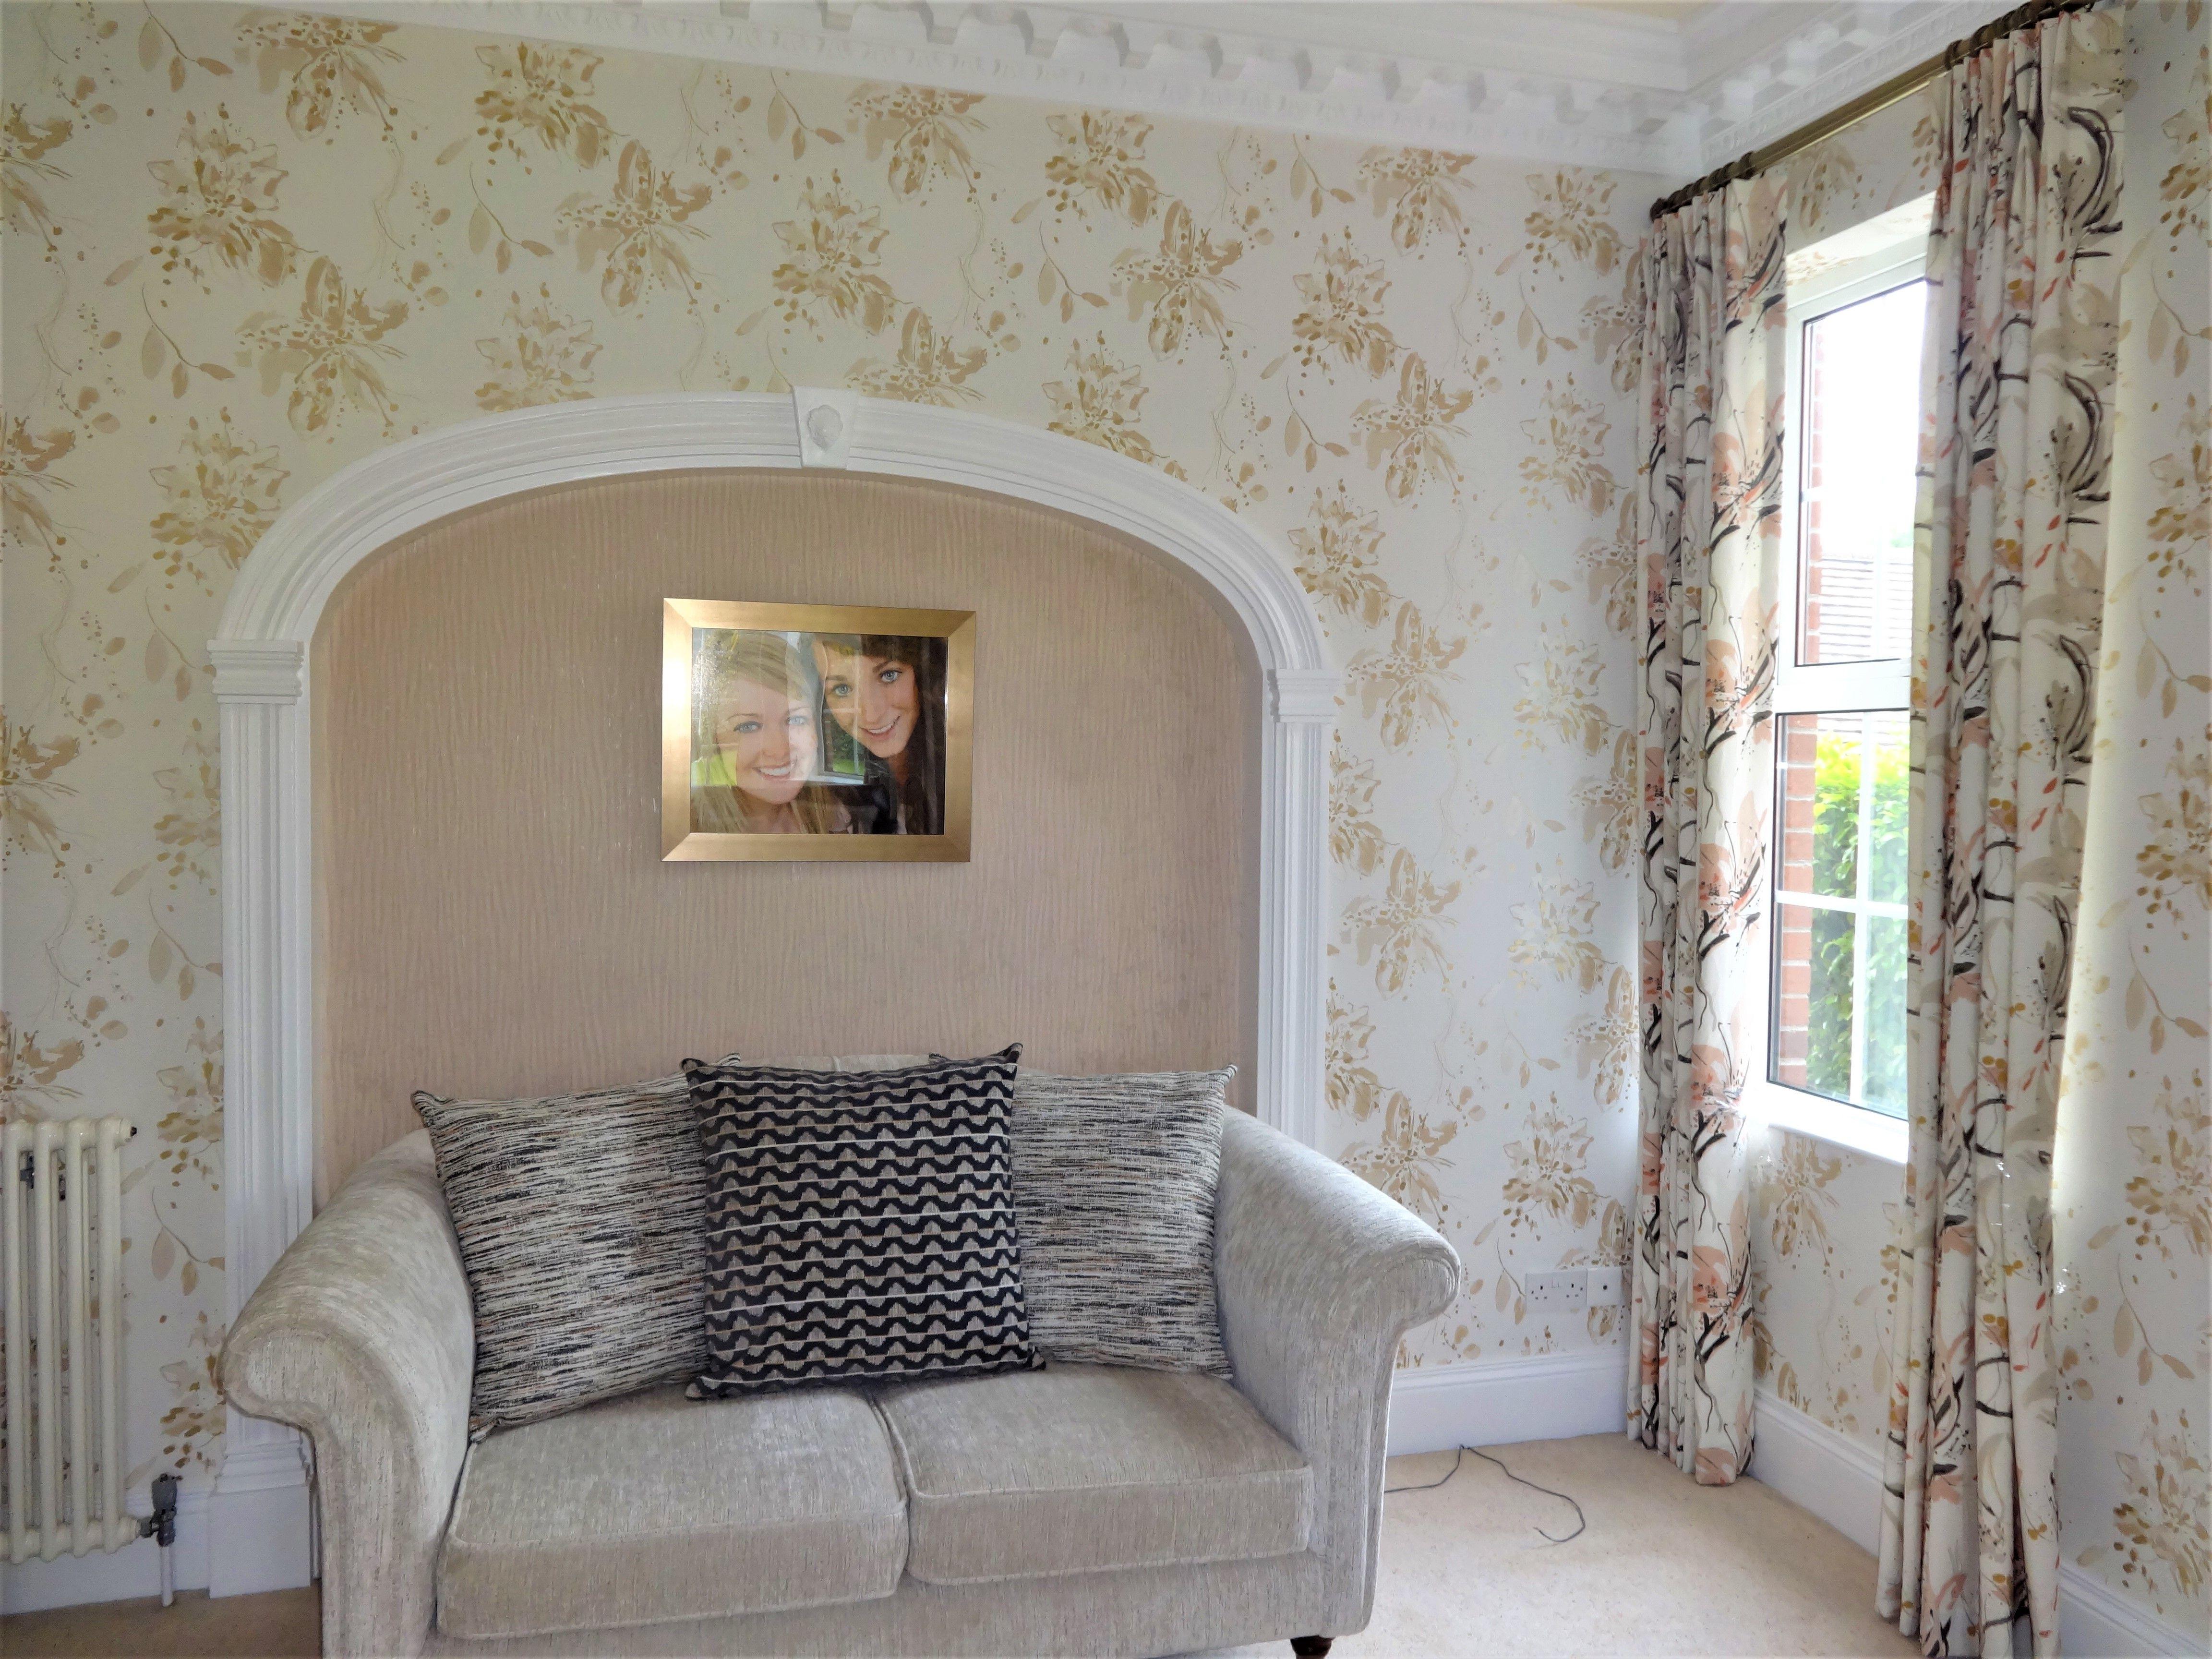 curtains and wallpaper from Villa Nova at Noctura